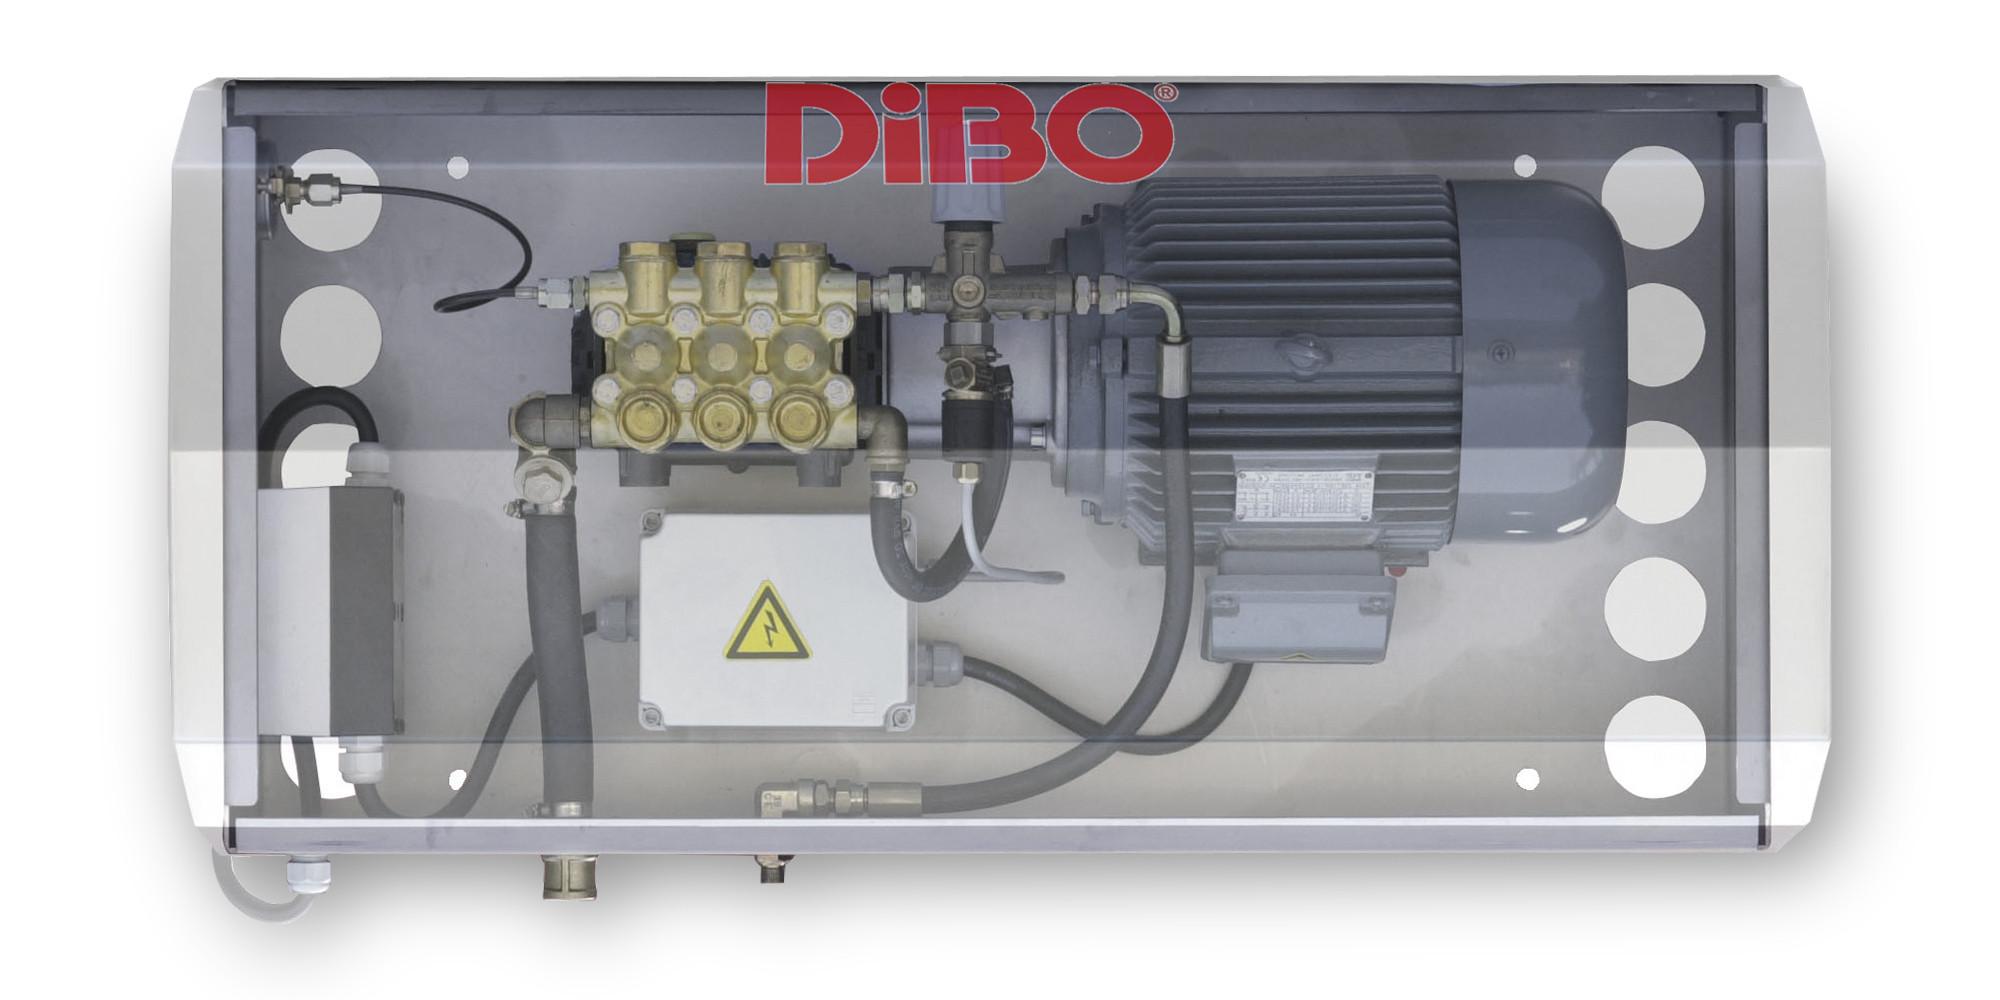 xxlarge_dibo-stationaire-reinigingsinstallatie-cpu-s